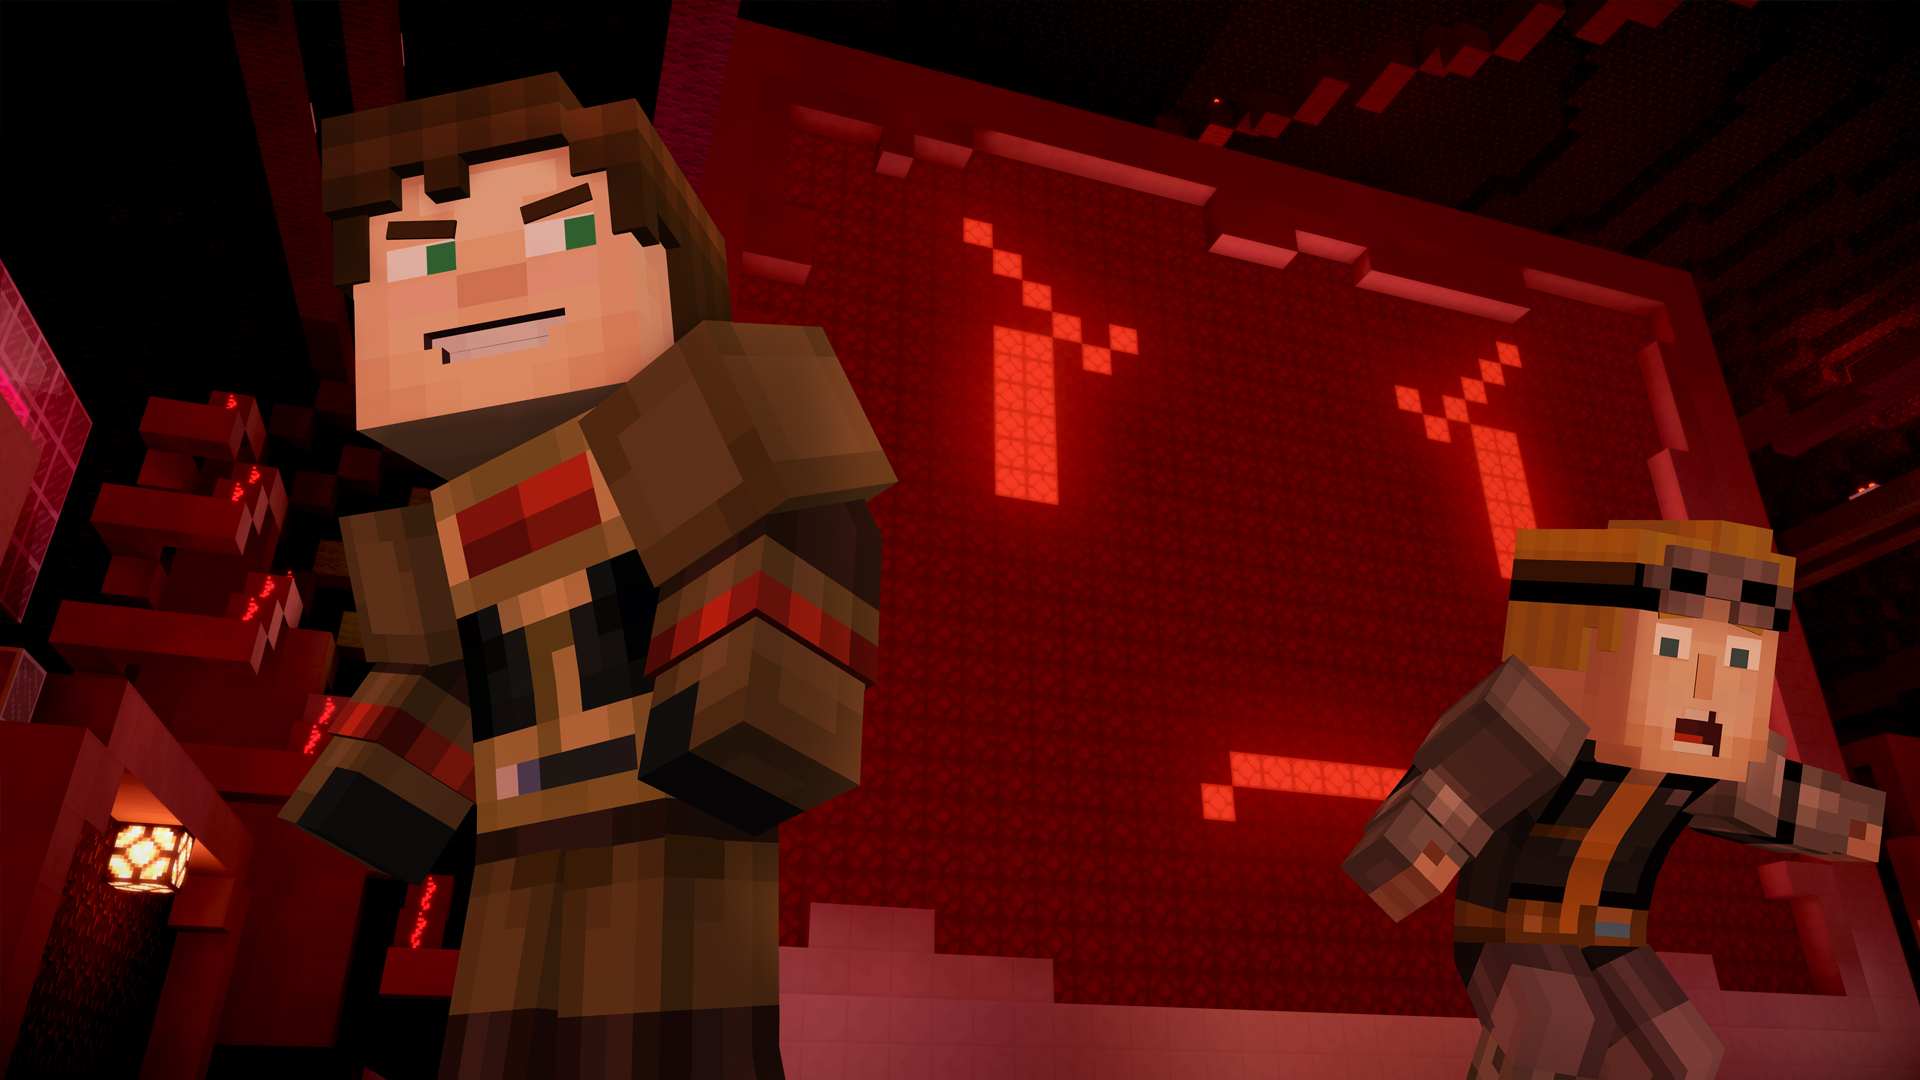 Amazon com: Minecraft: Story Mode - Adventure Pass [Steam